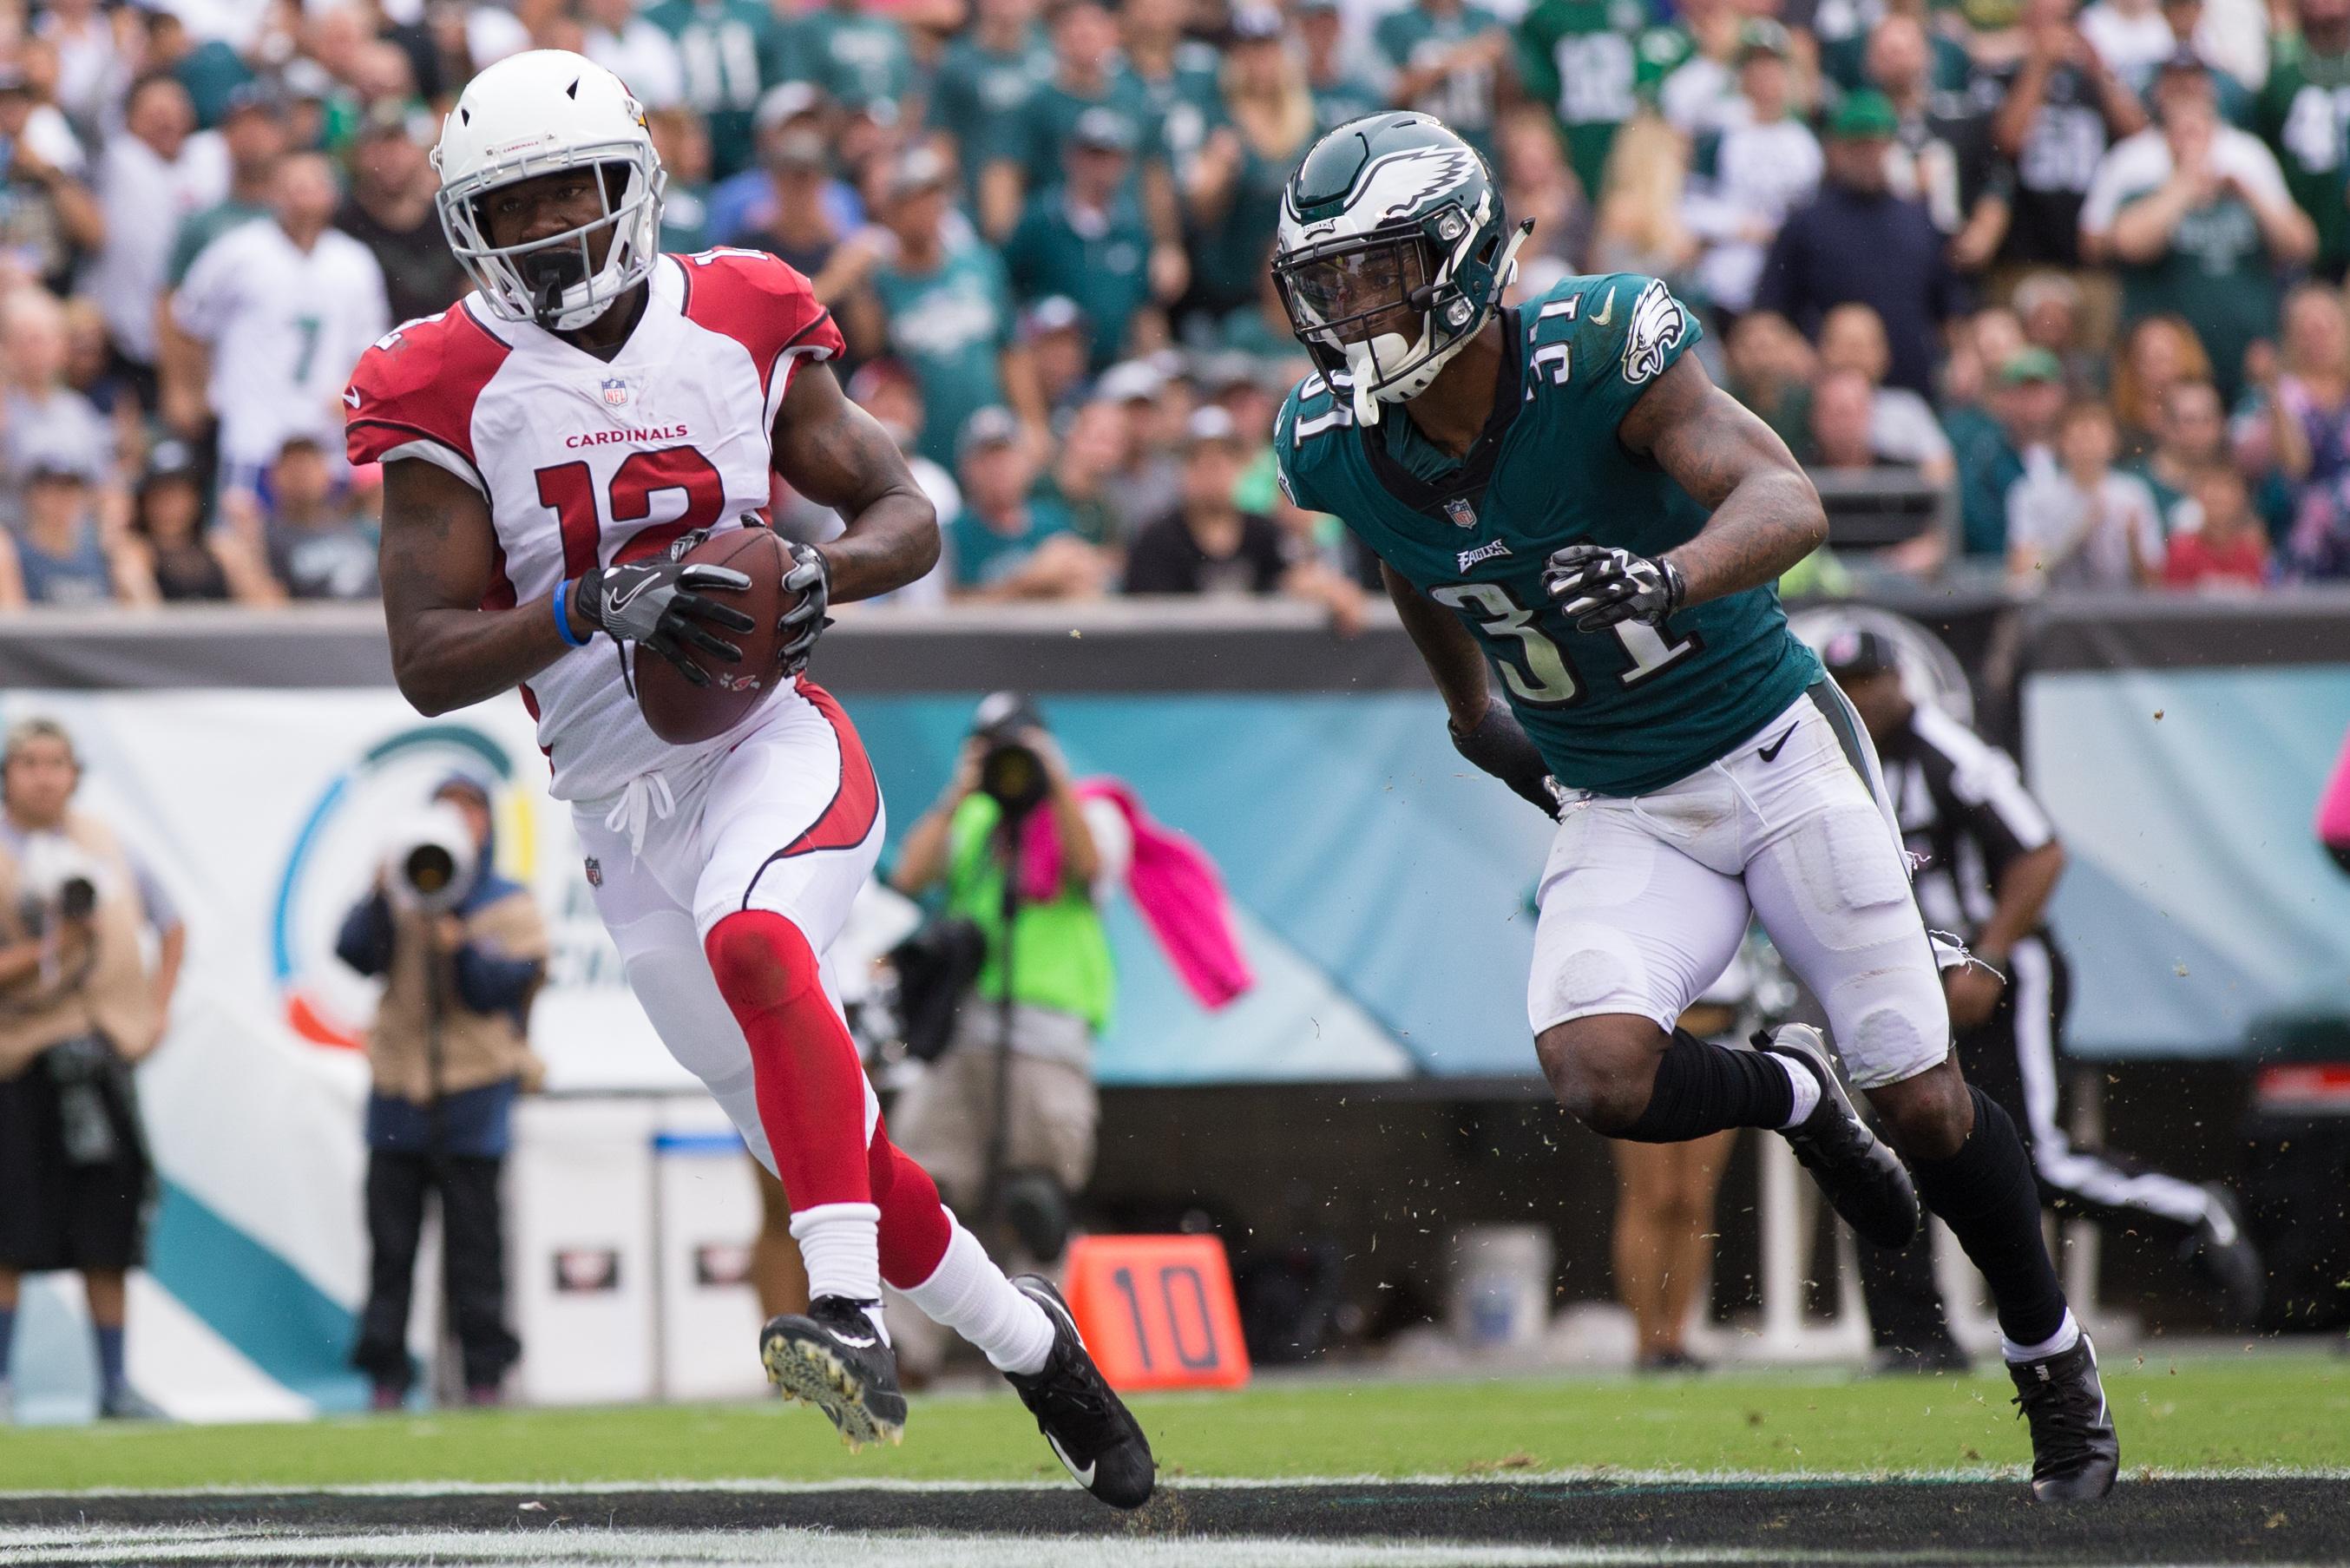 NFL: Arizona Cardinals at Philadelphia Eagles